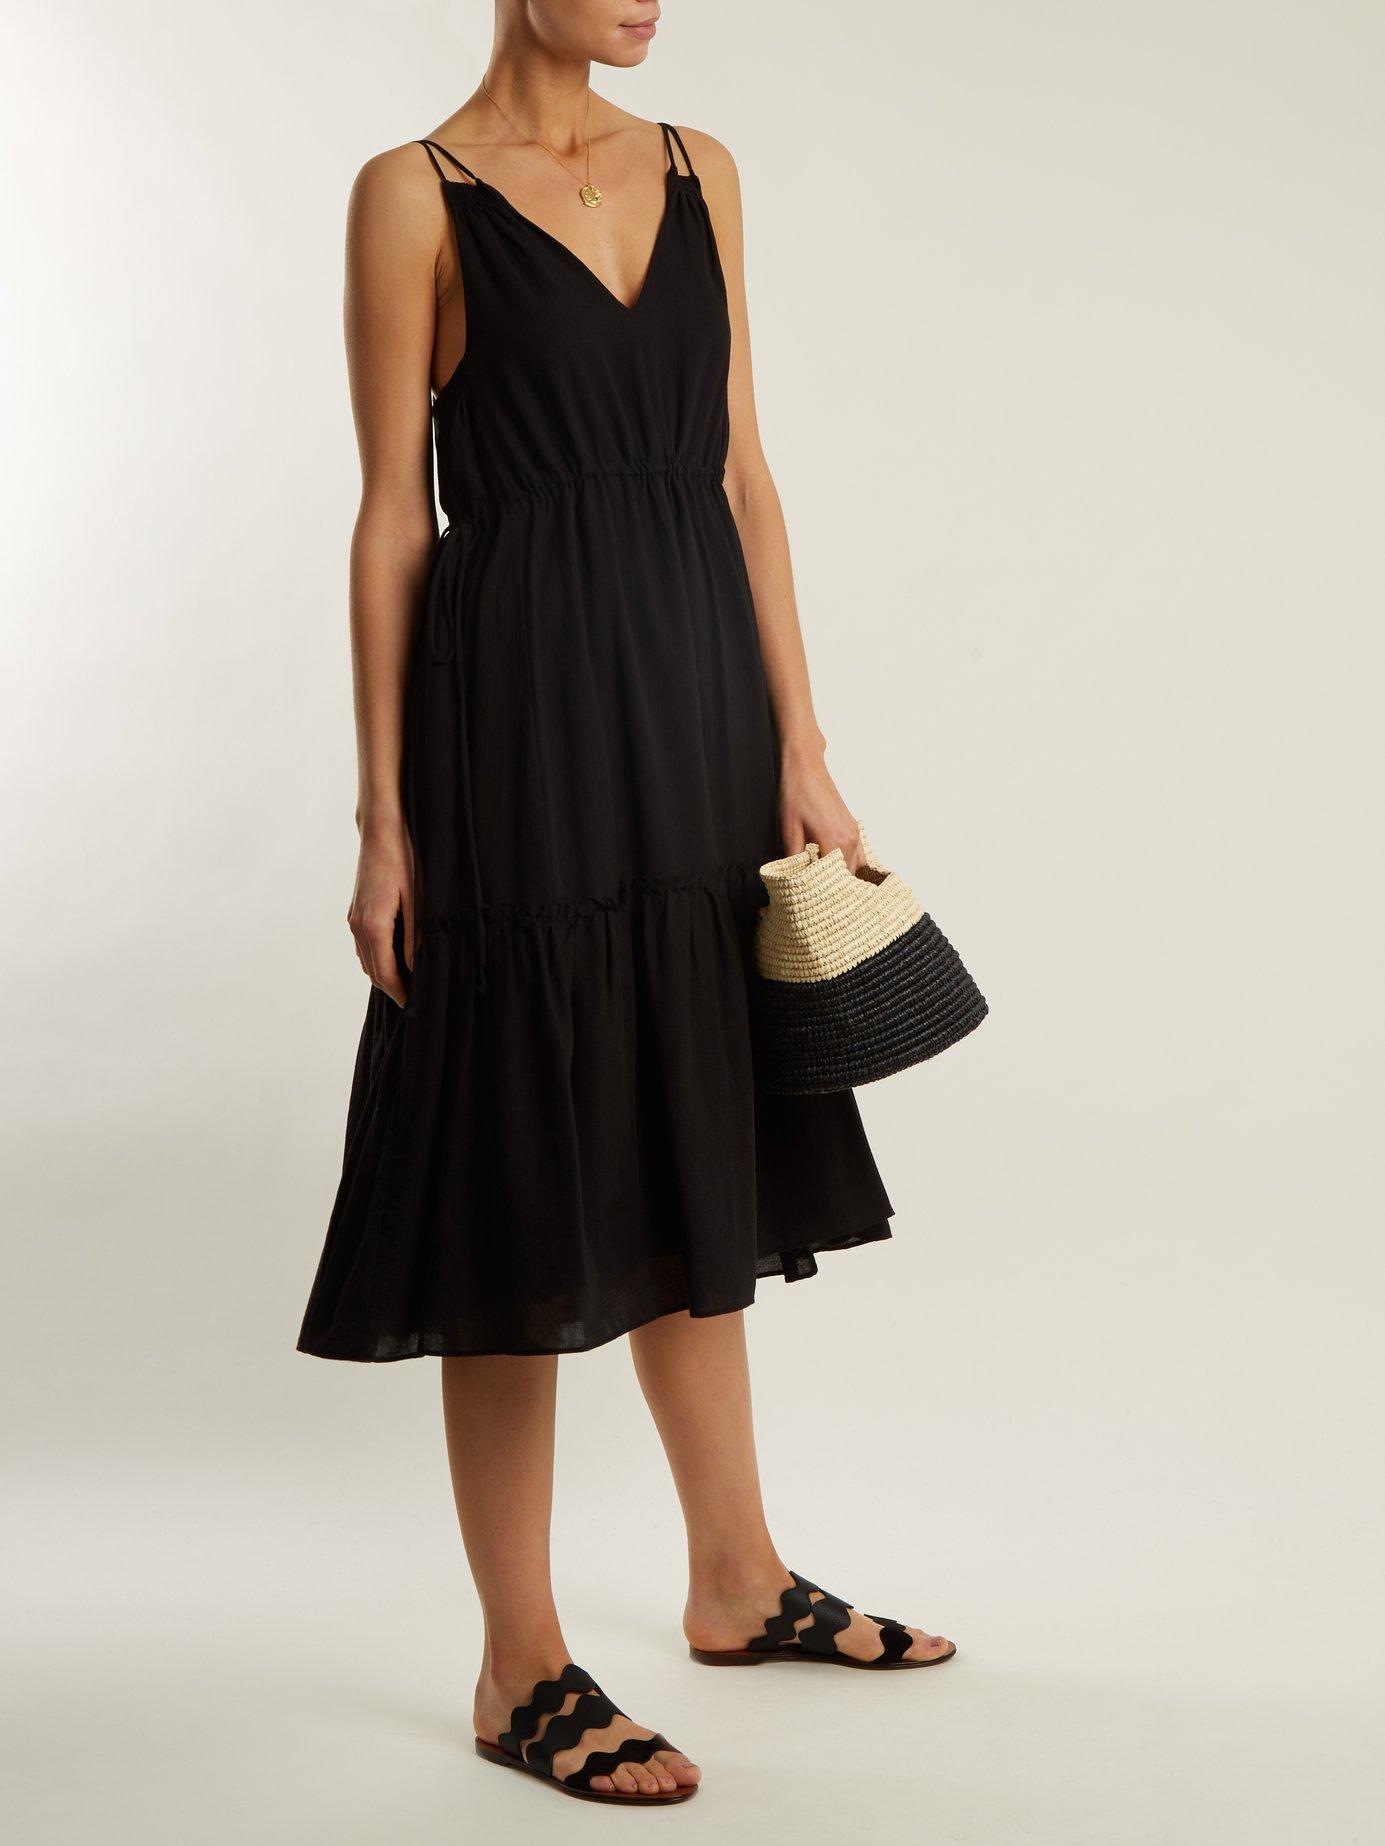 Daphne tiered cotton dress by Apiece Apart